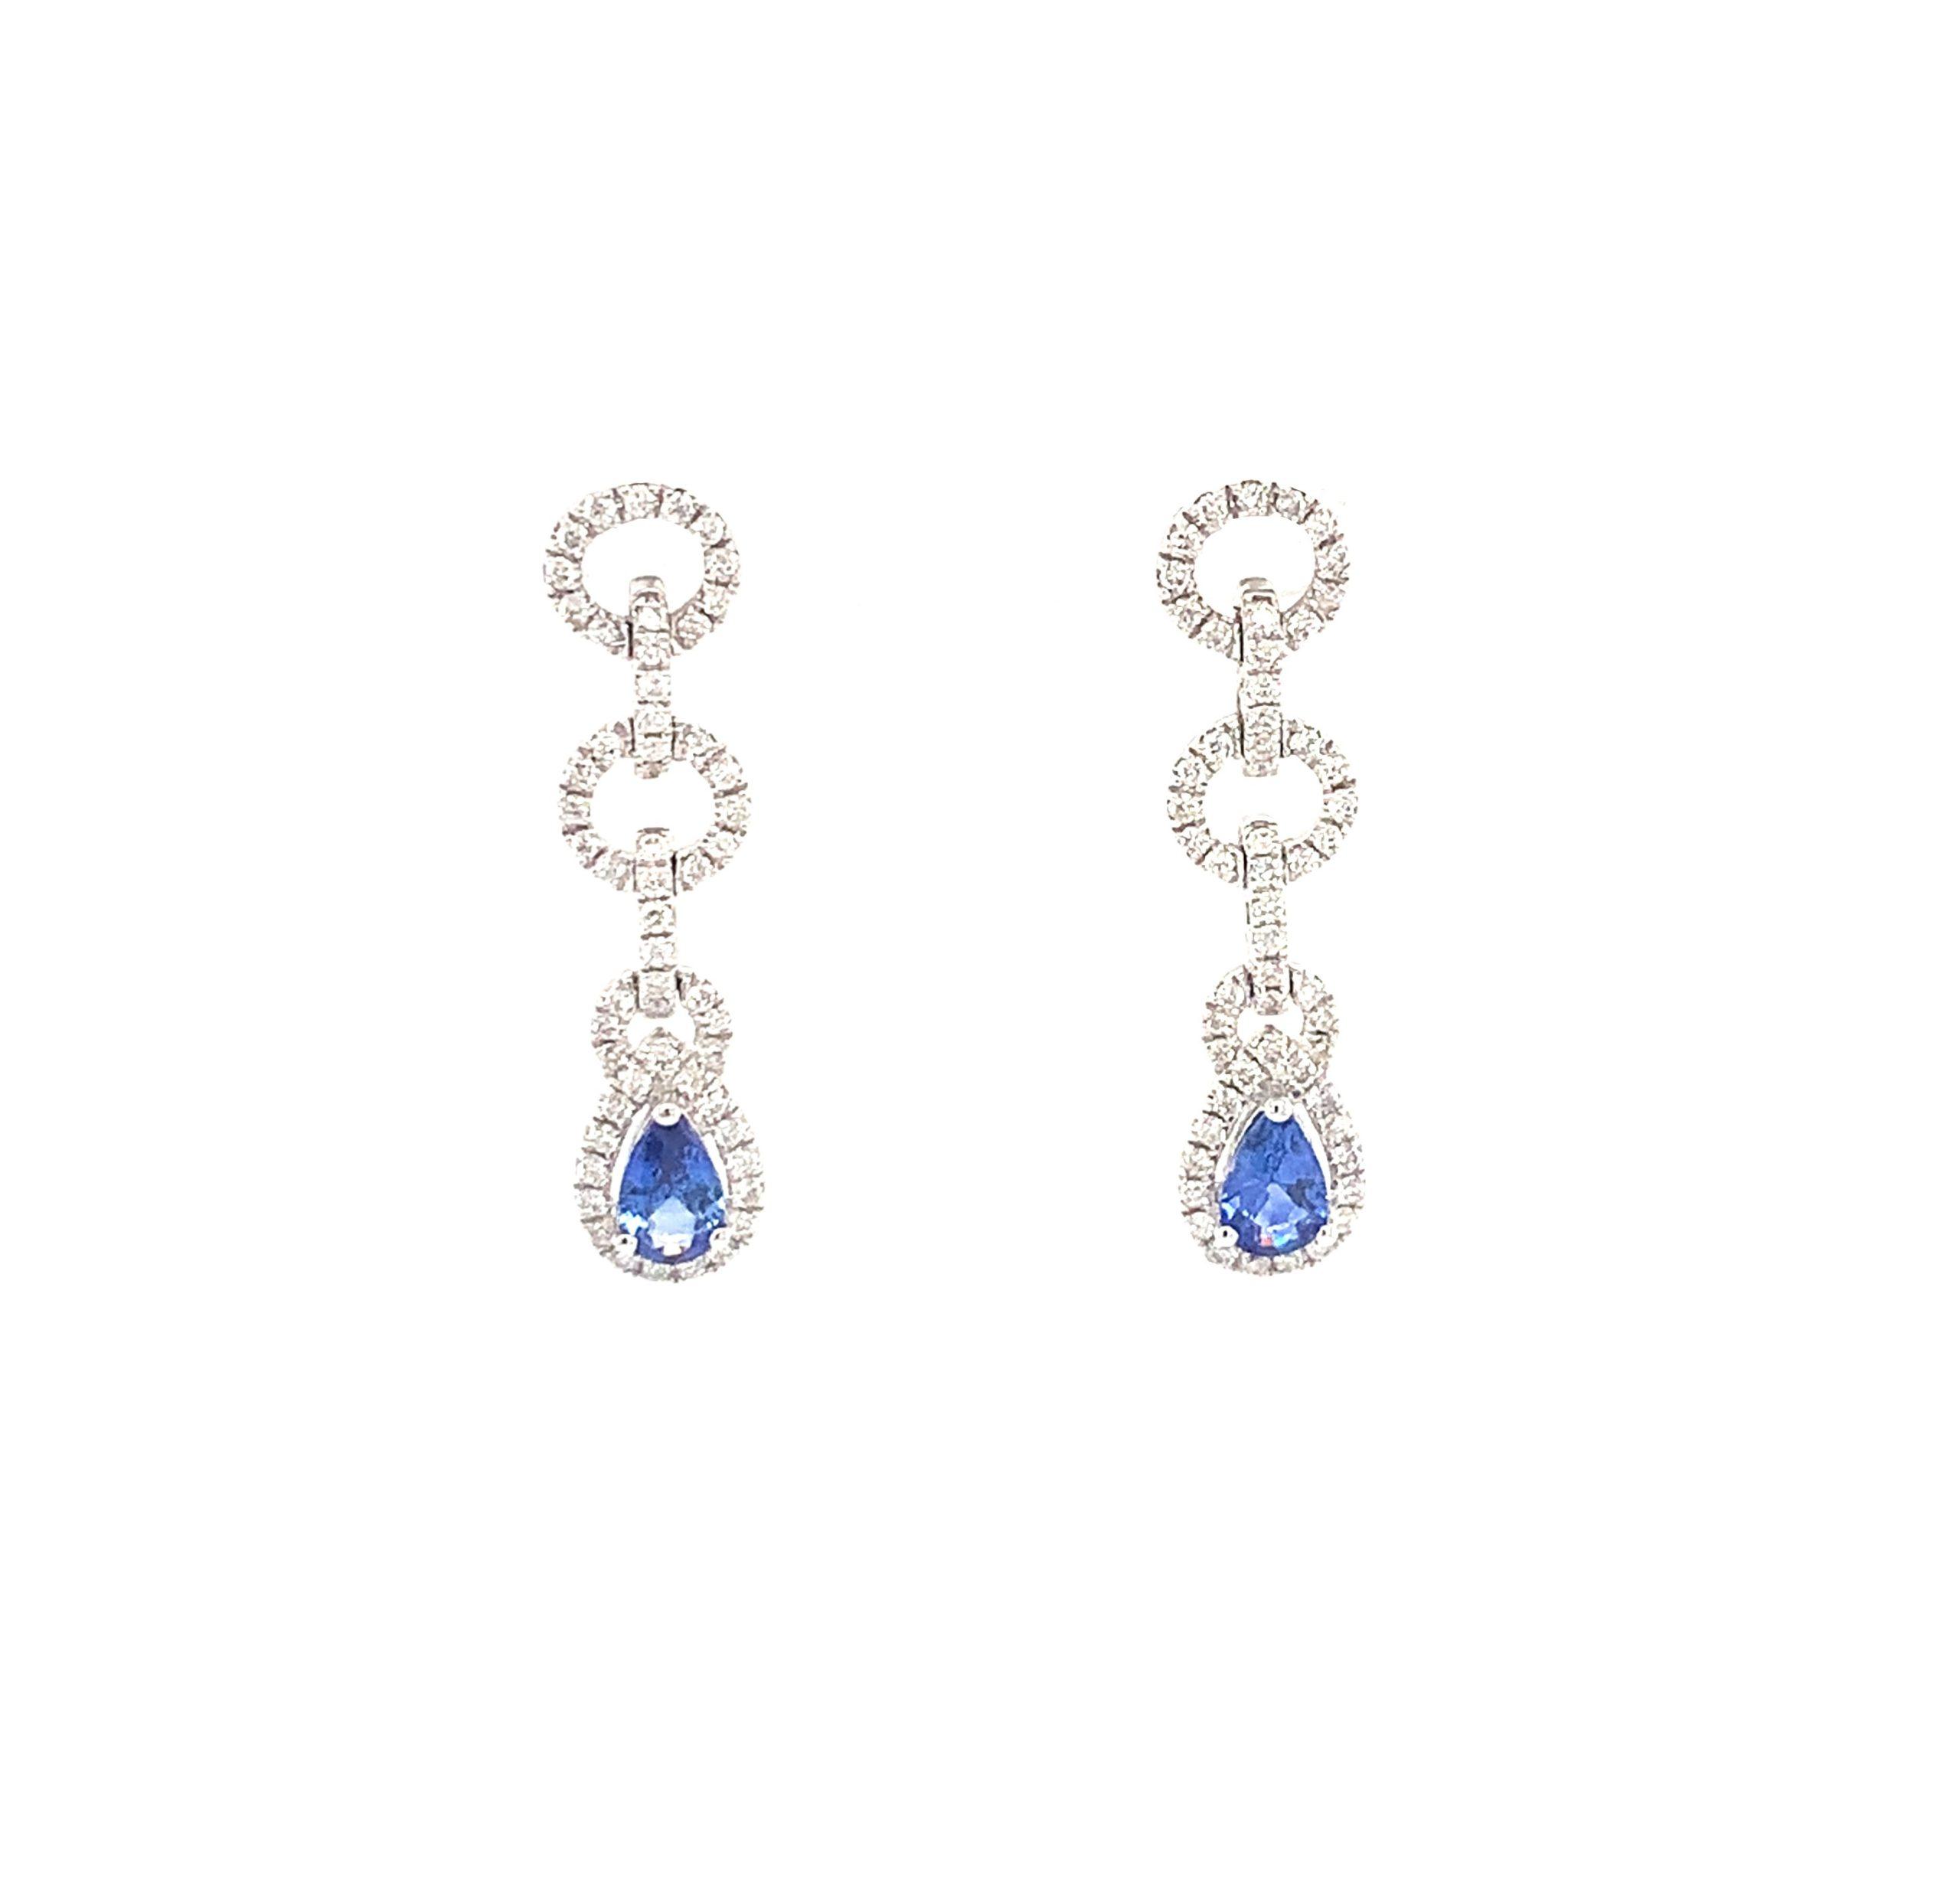 White Gold Sapphire Earrings